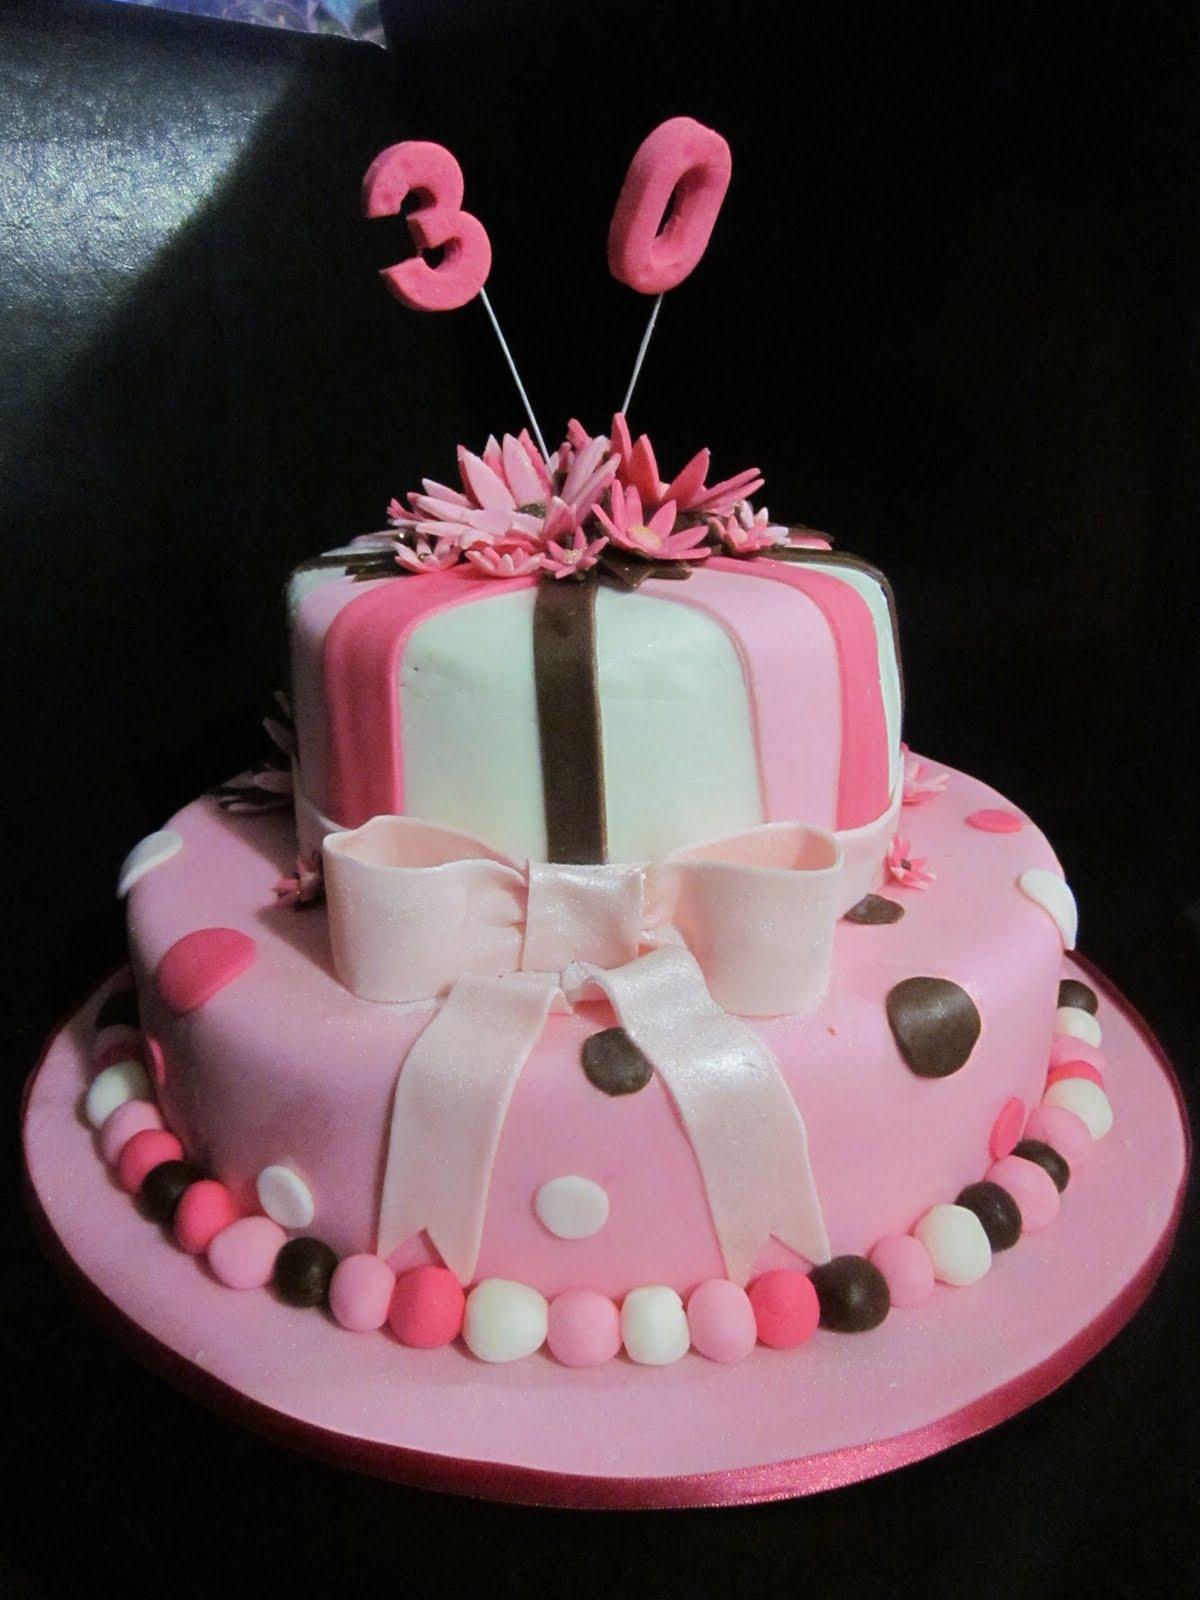 Deb S Cakes And Cupcakes Females 30th Birthday Cake